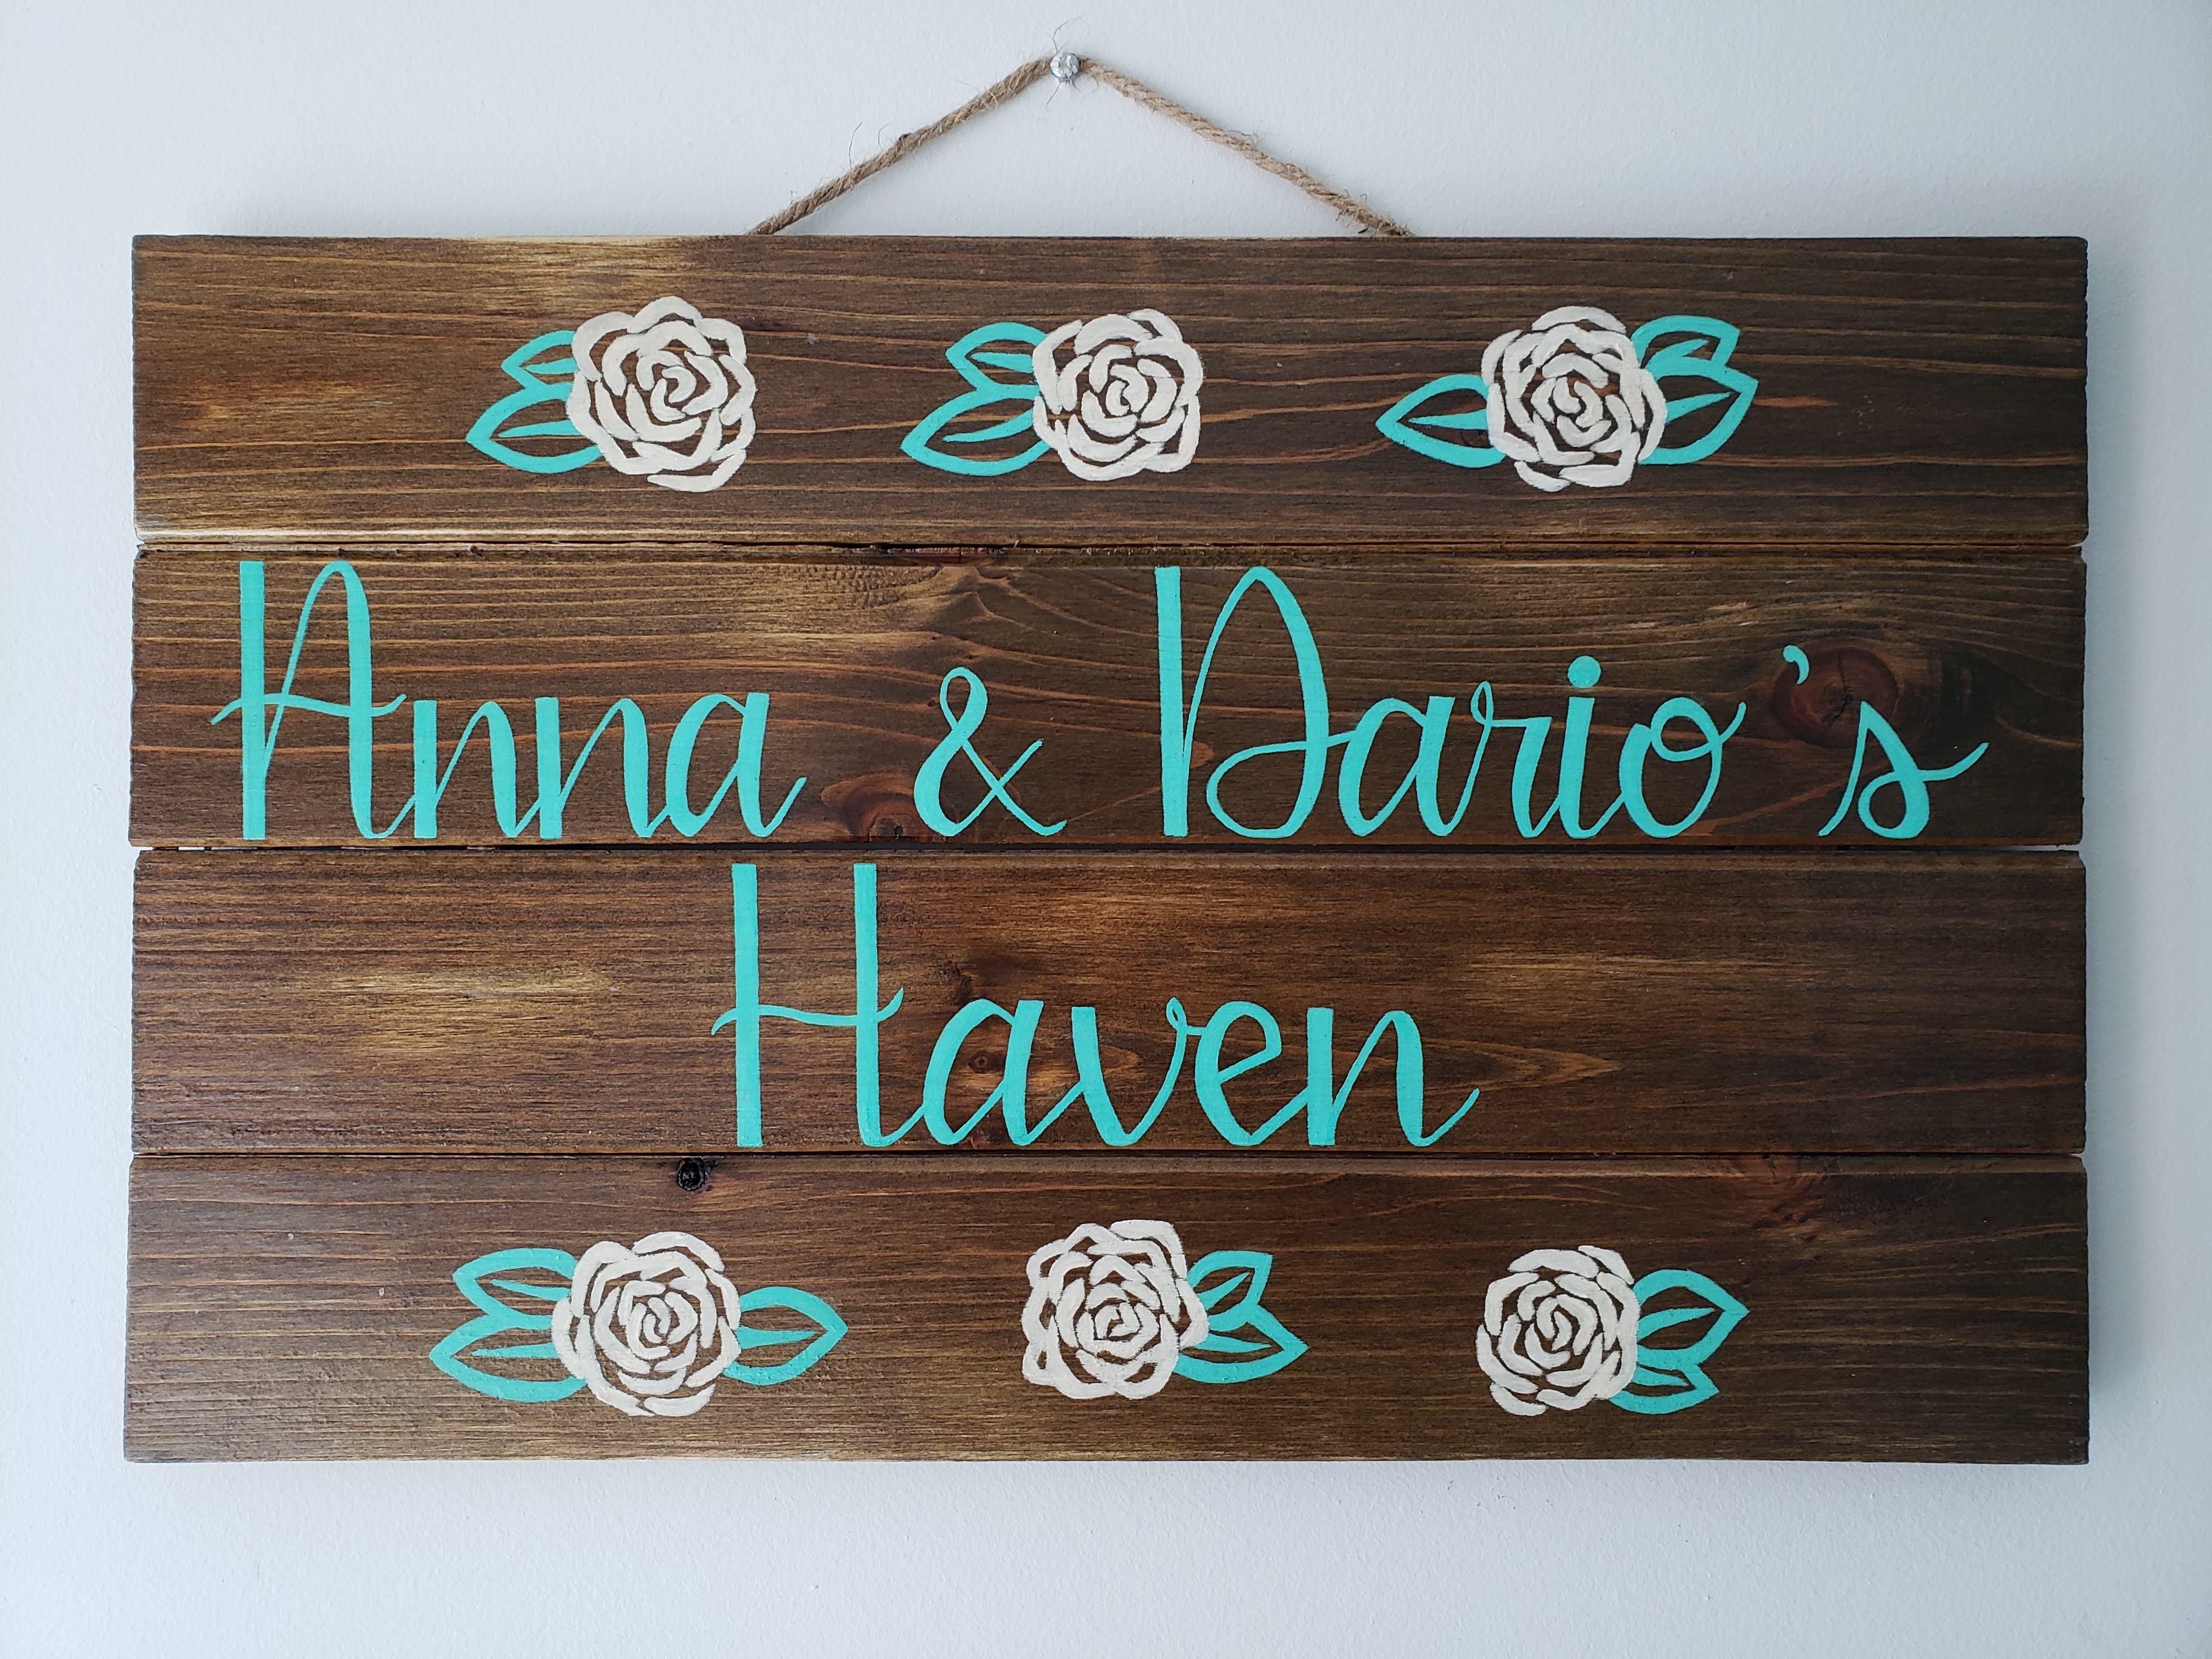 Anna & Dario's Haven (2020)